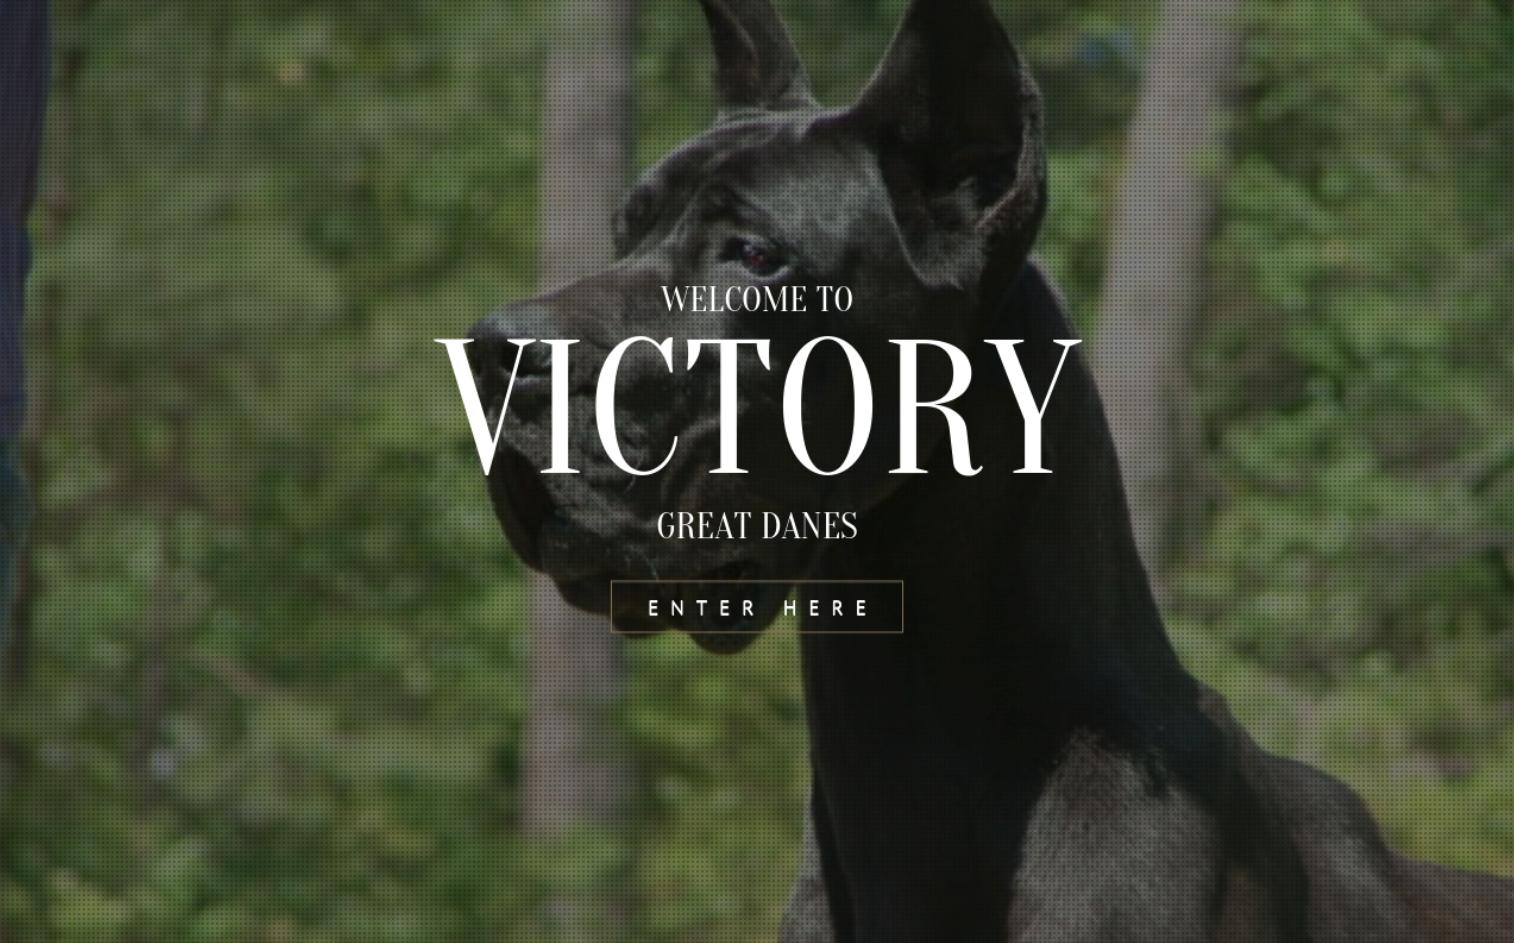 Victory Great Danes